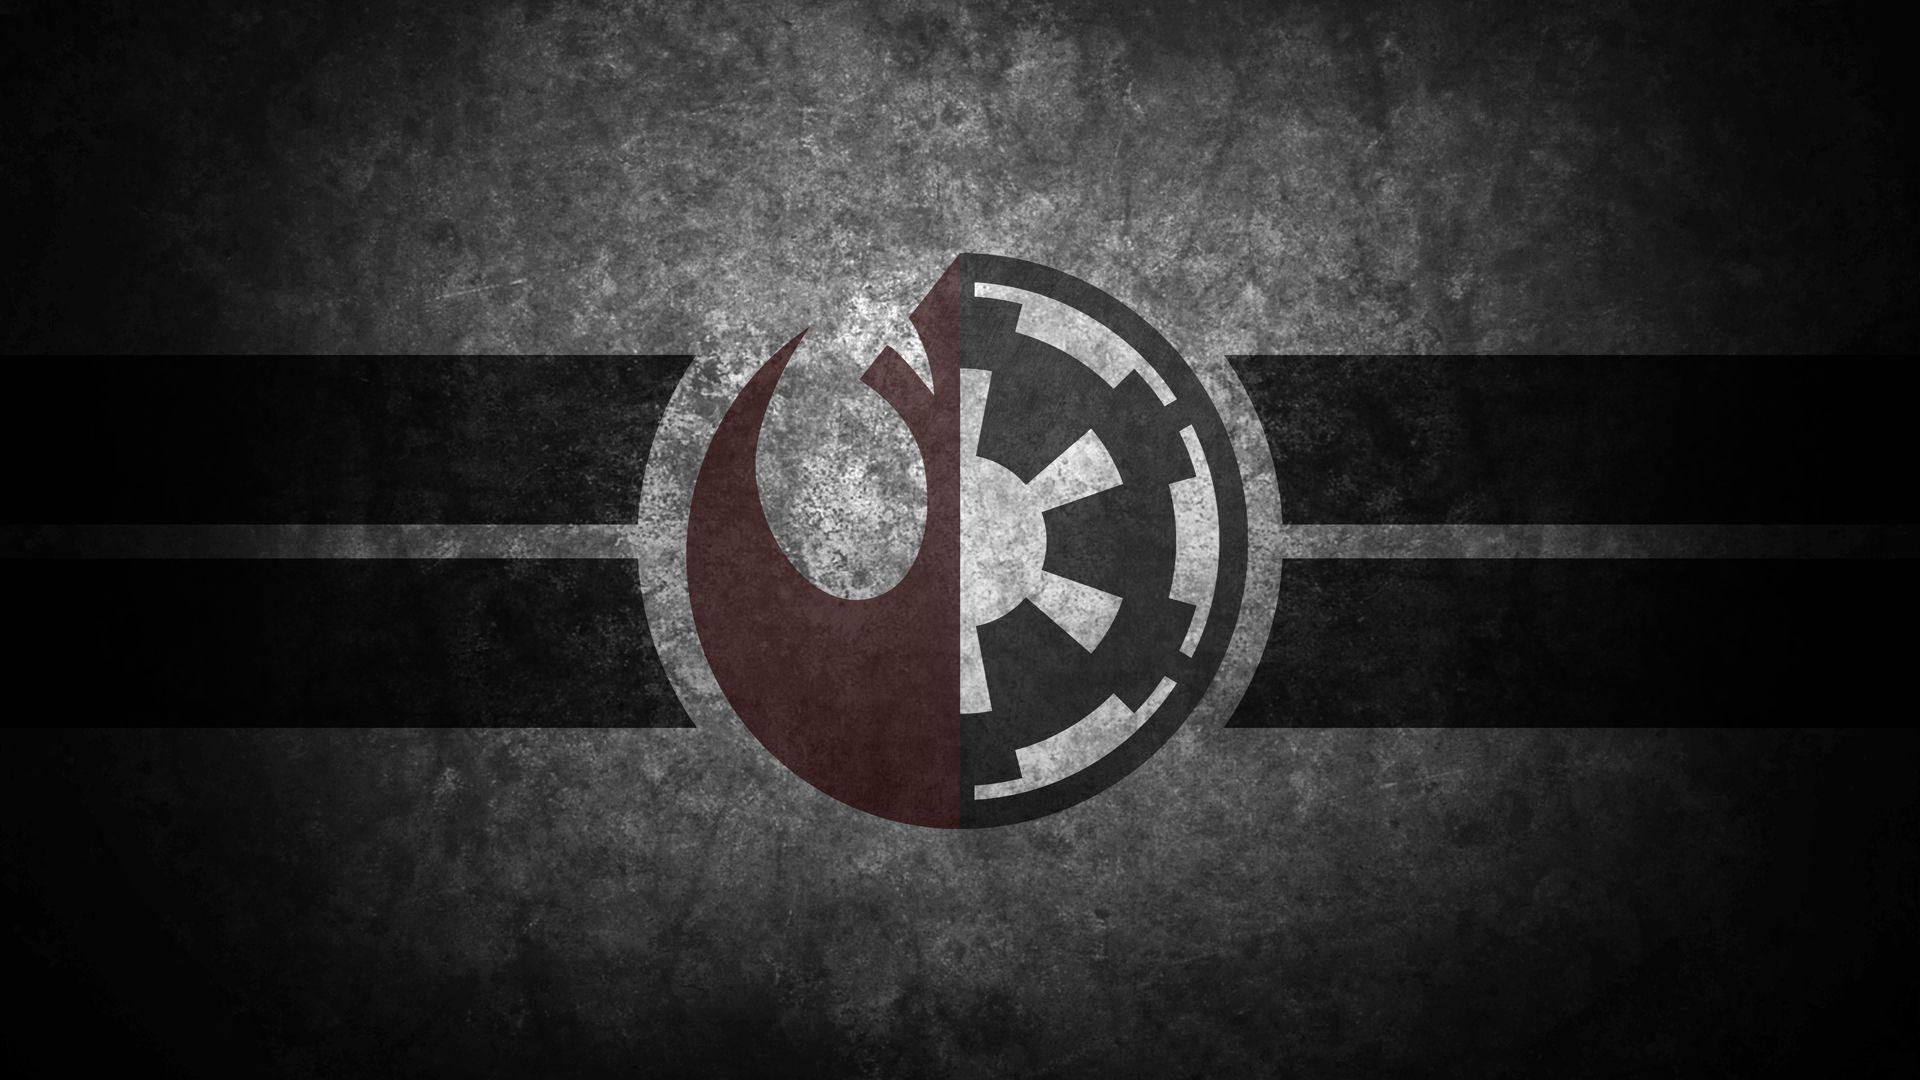 Star Wars Divided Allegiance Desktop Wallpaper Star Wars Wallpaper Iphone Wallpaper Stars Empire Wallpaper